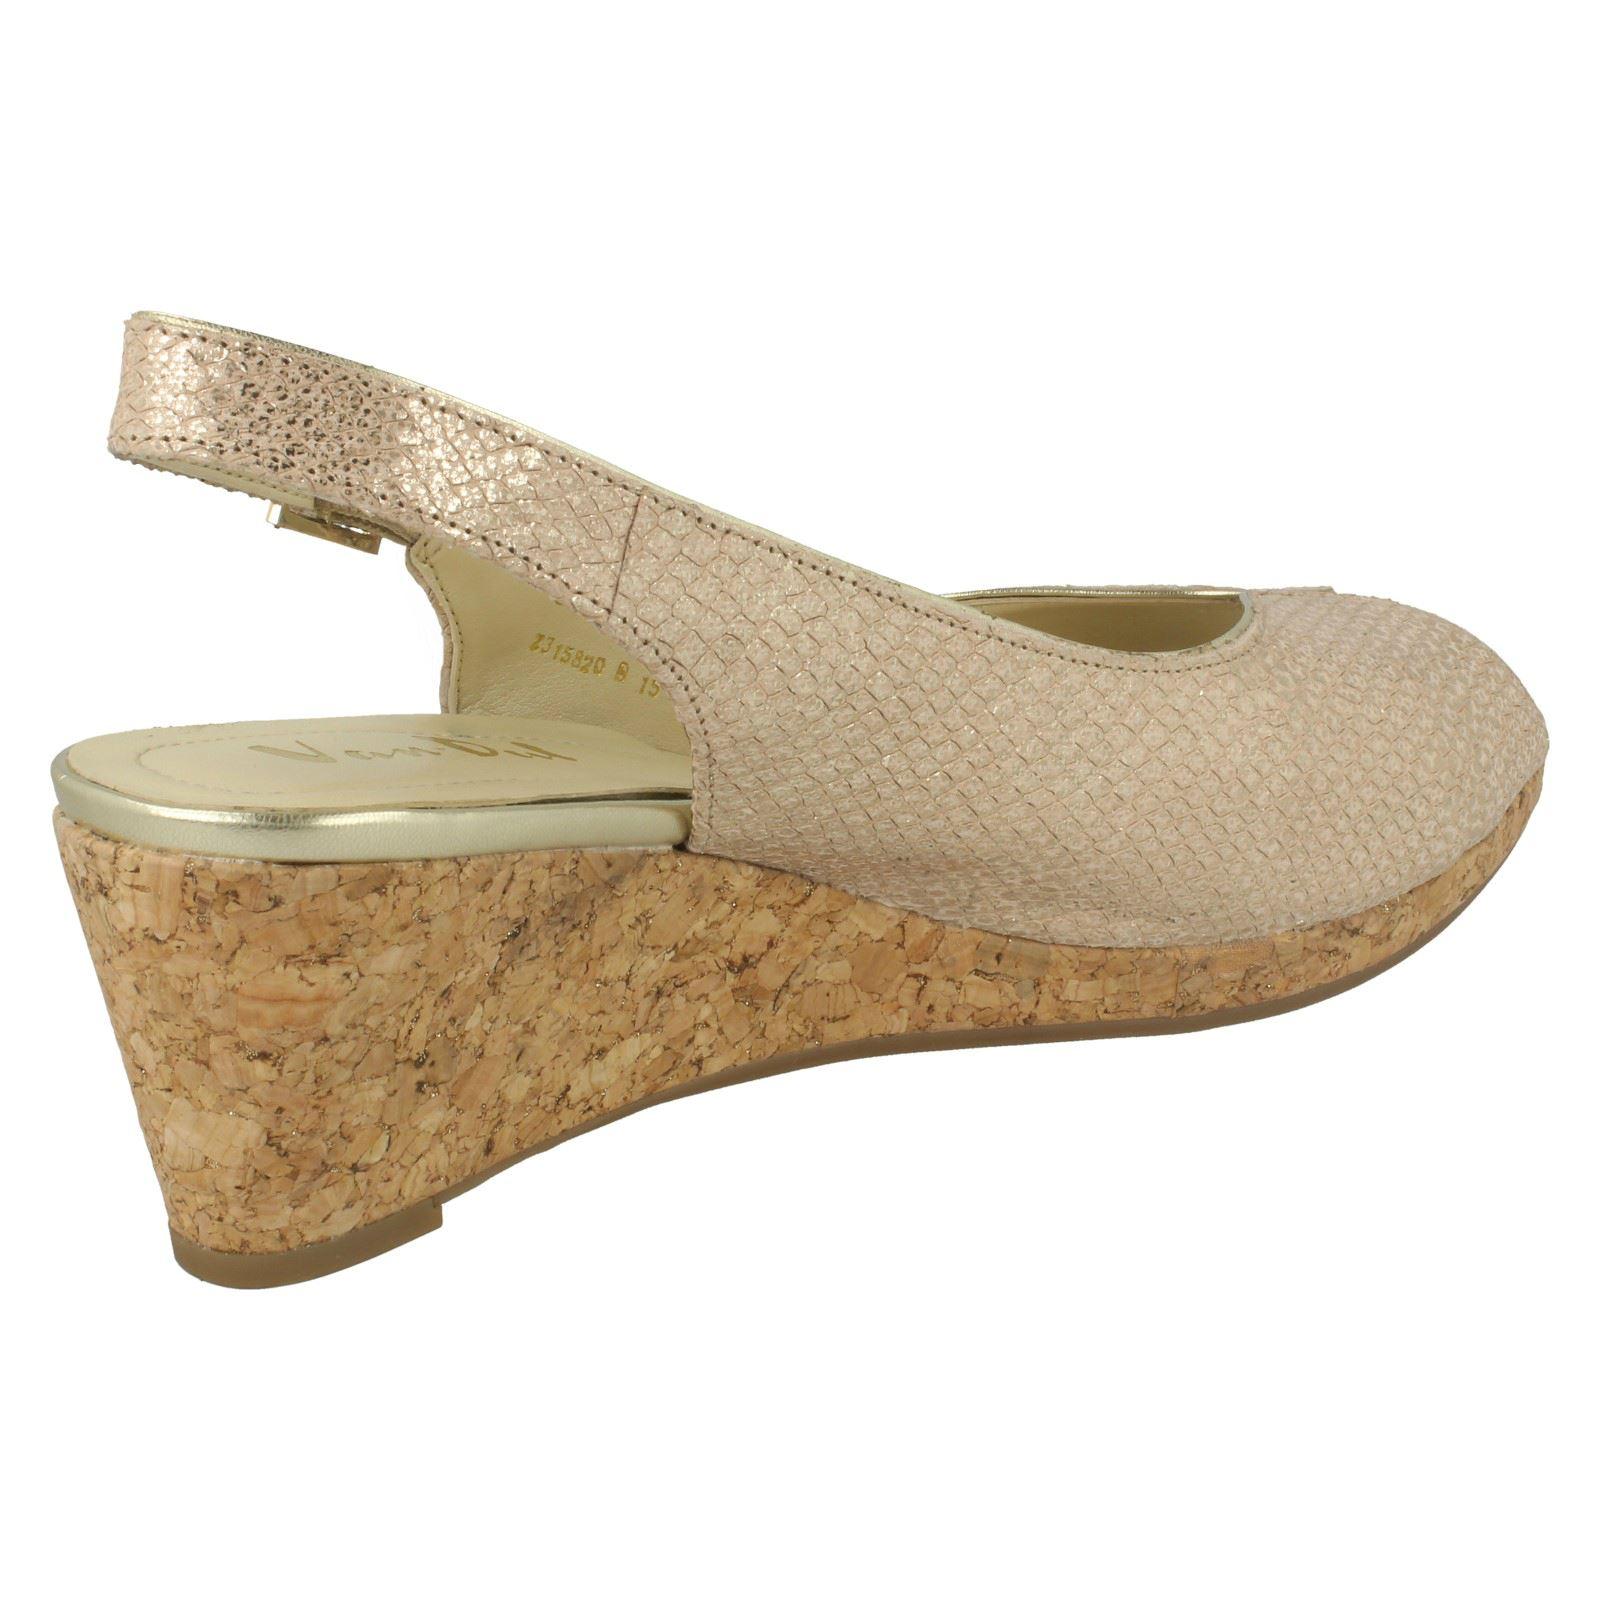 Ladies-Van-Dal-Cork-Wedge-Sandals-Gable thumbnail 5